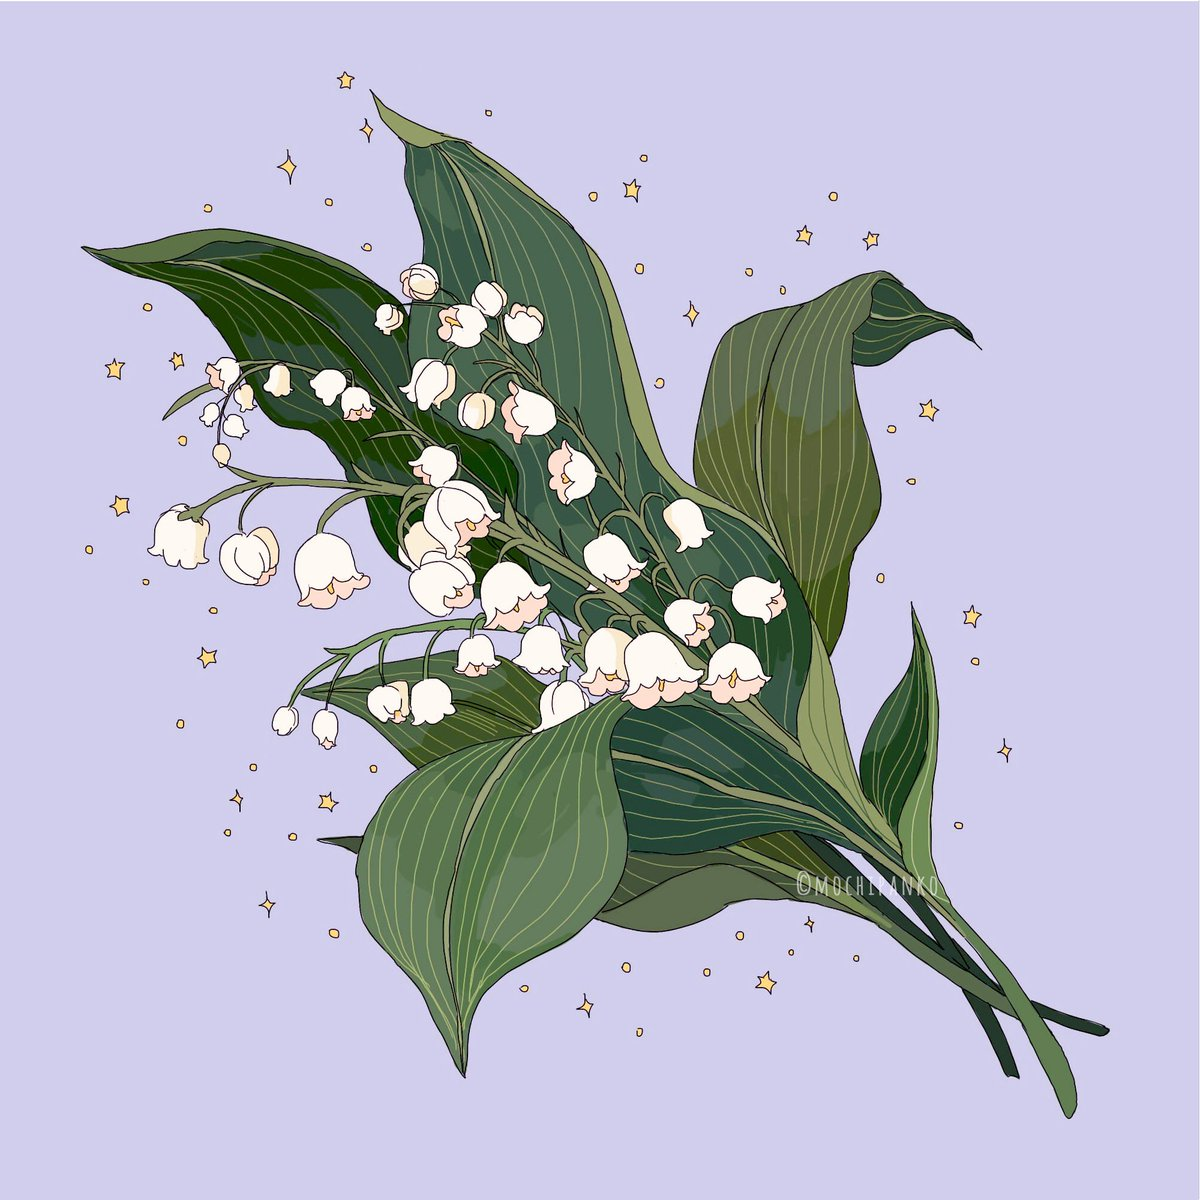 Liya dokomi d21 on twitter r e f l o r e s c e r e flower liya dokomi d21 on twitter r e f l o r e s c e r e flower zine flower set no 5 white egret orchid habenaria radiata lily of the valley izmirmasajfo Gallery